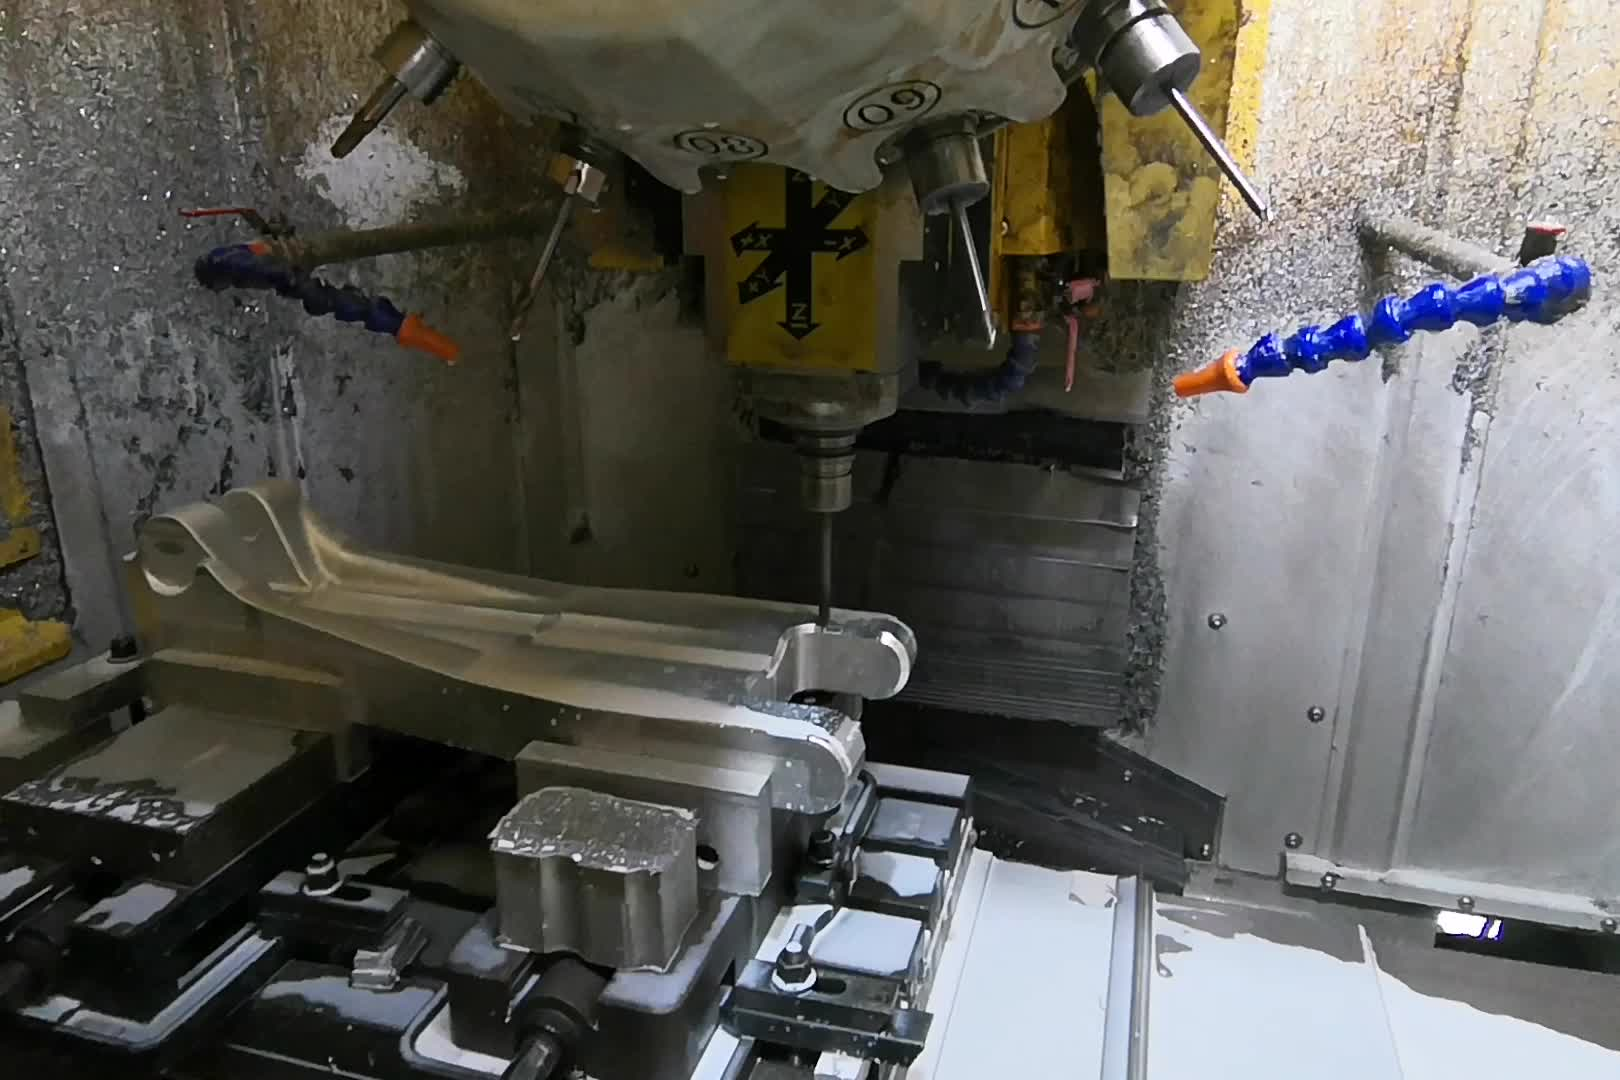 High Quality China Aluminum Cnc Machining Parts, Cnc Machined Aluminum parts, Anodized Cnc Machining Hardware Metal Parts